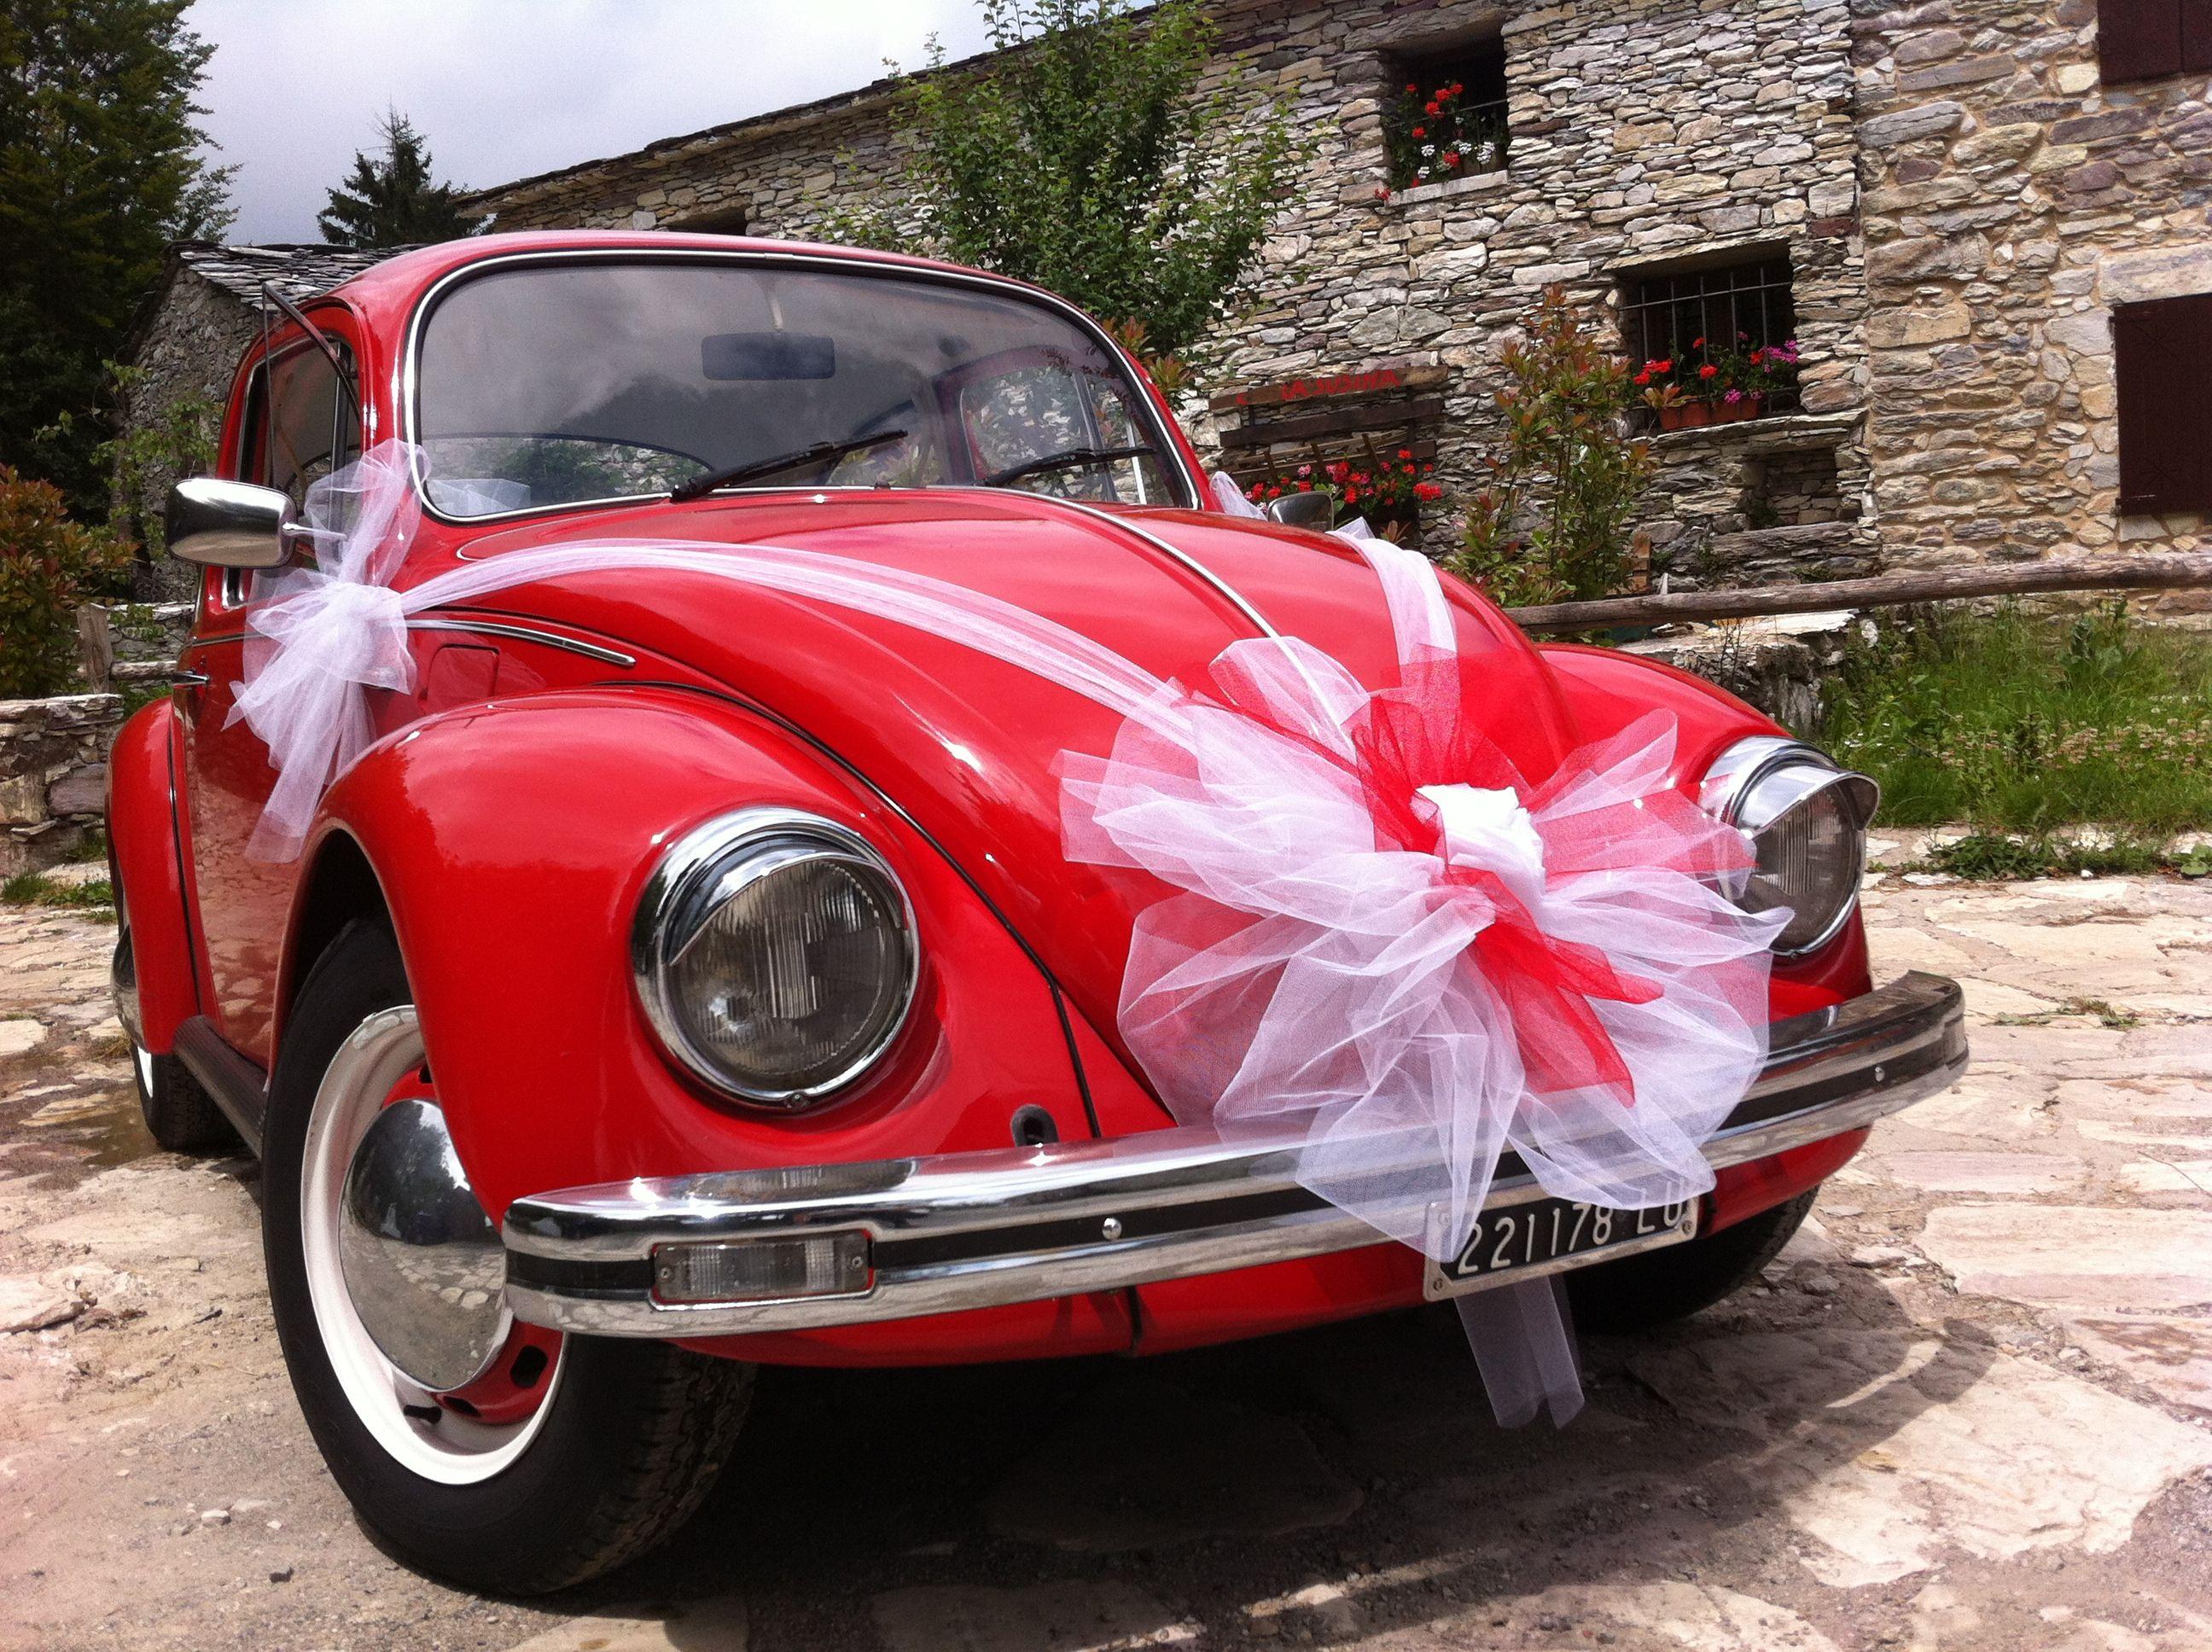 Noleggio maggiolino per matrimonio a 100 euro | WEDDING ...